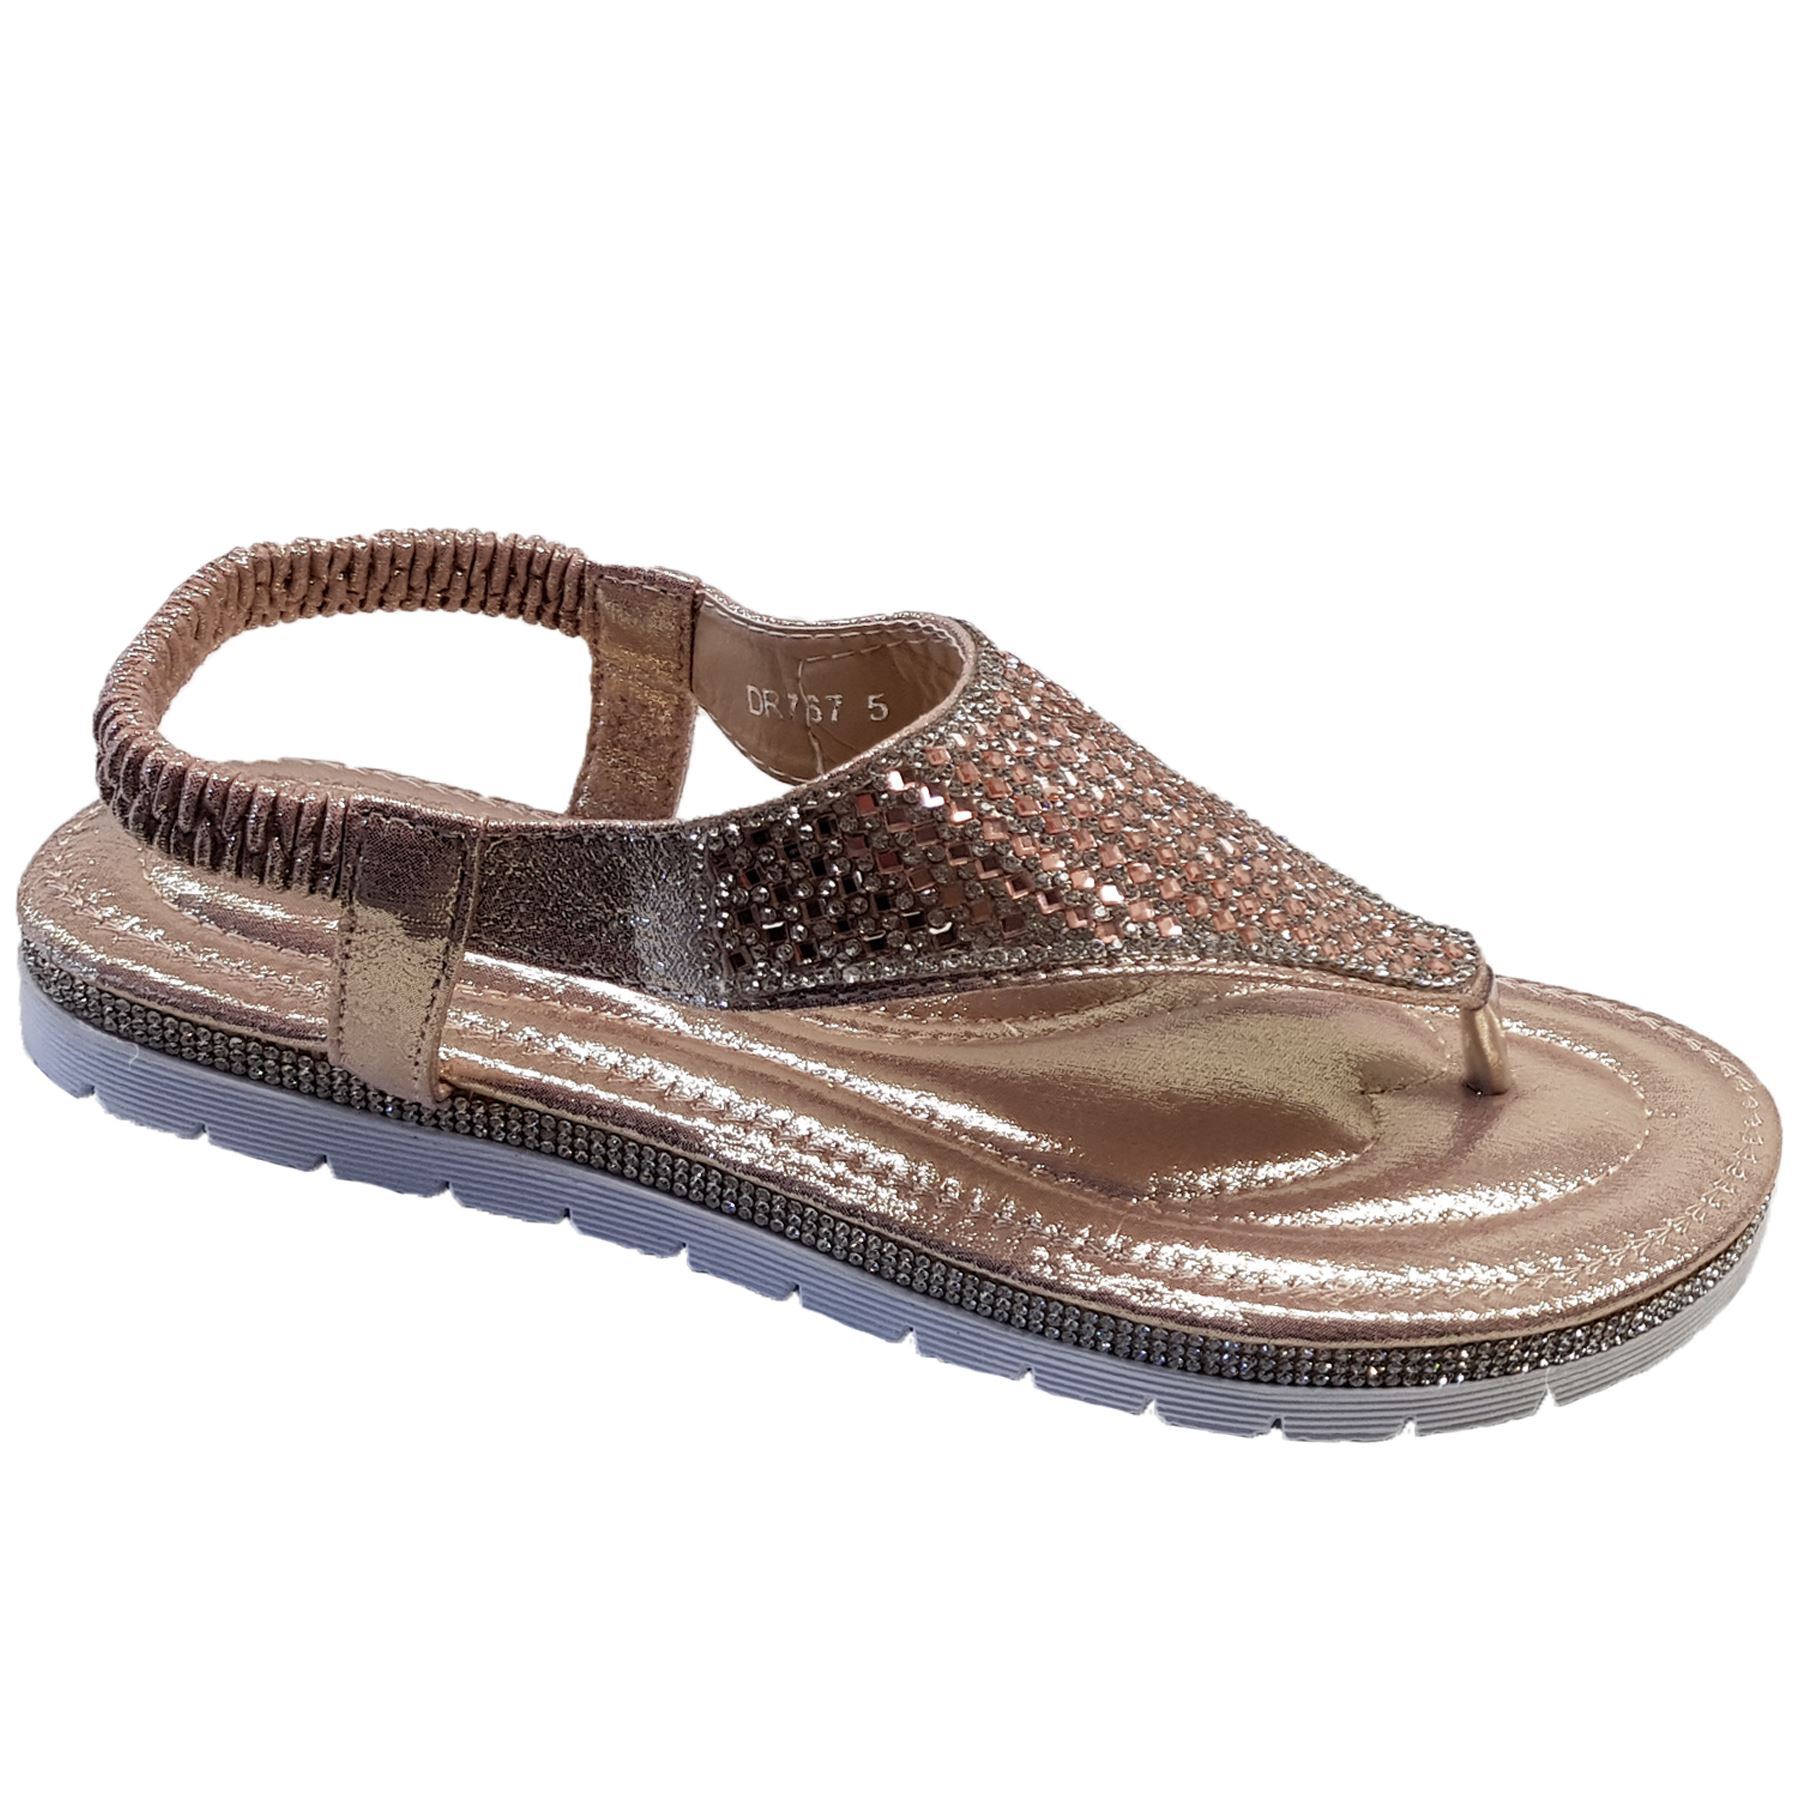 f6ca650bffe60 Womens Gem Diamante Slingback Toe Post simili cuir mode Thong sandales